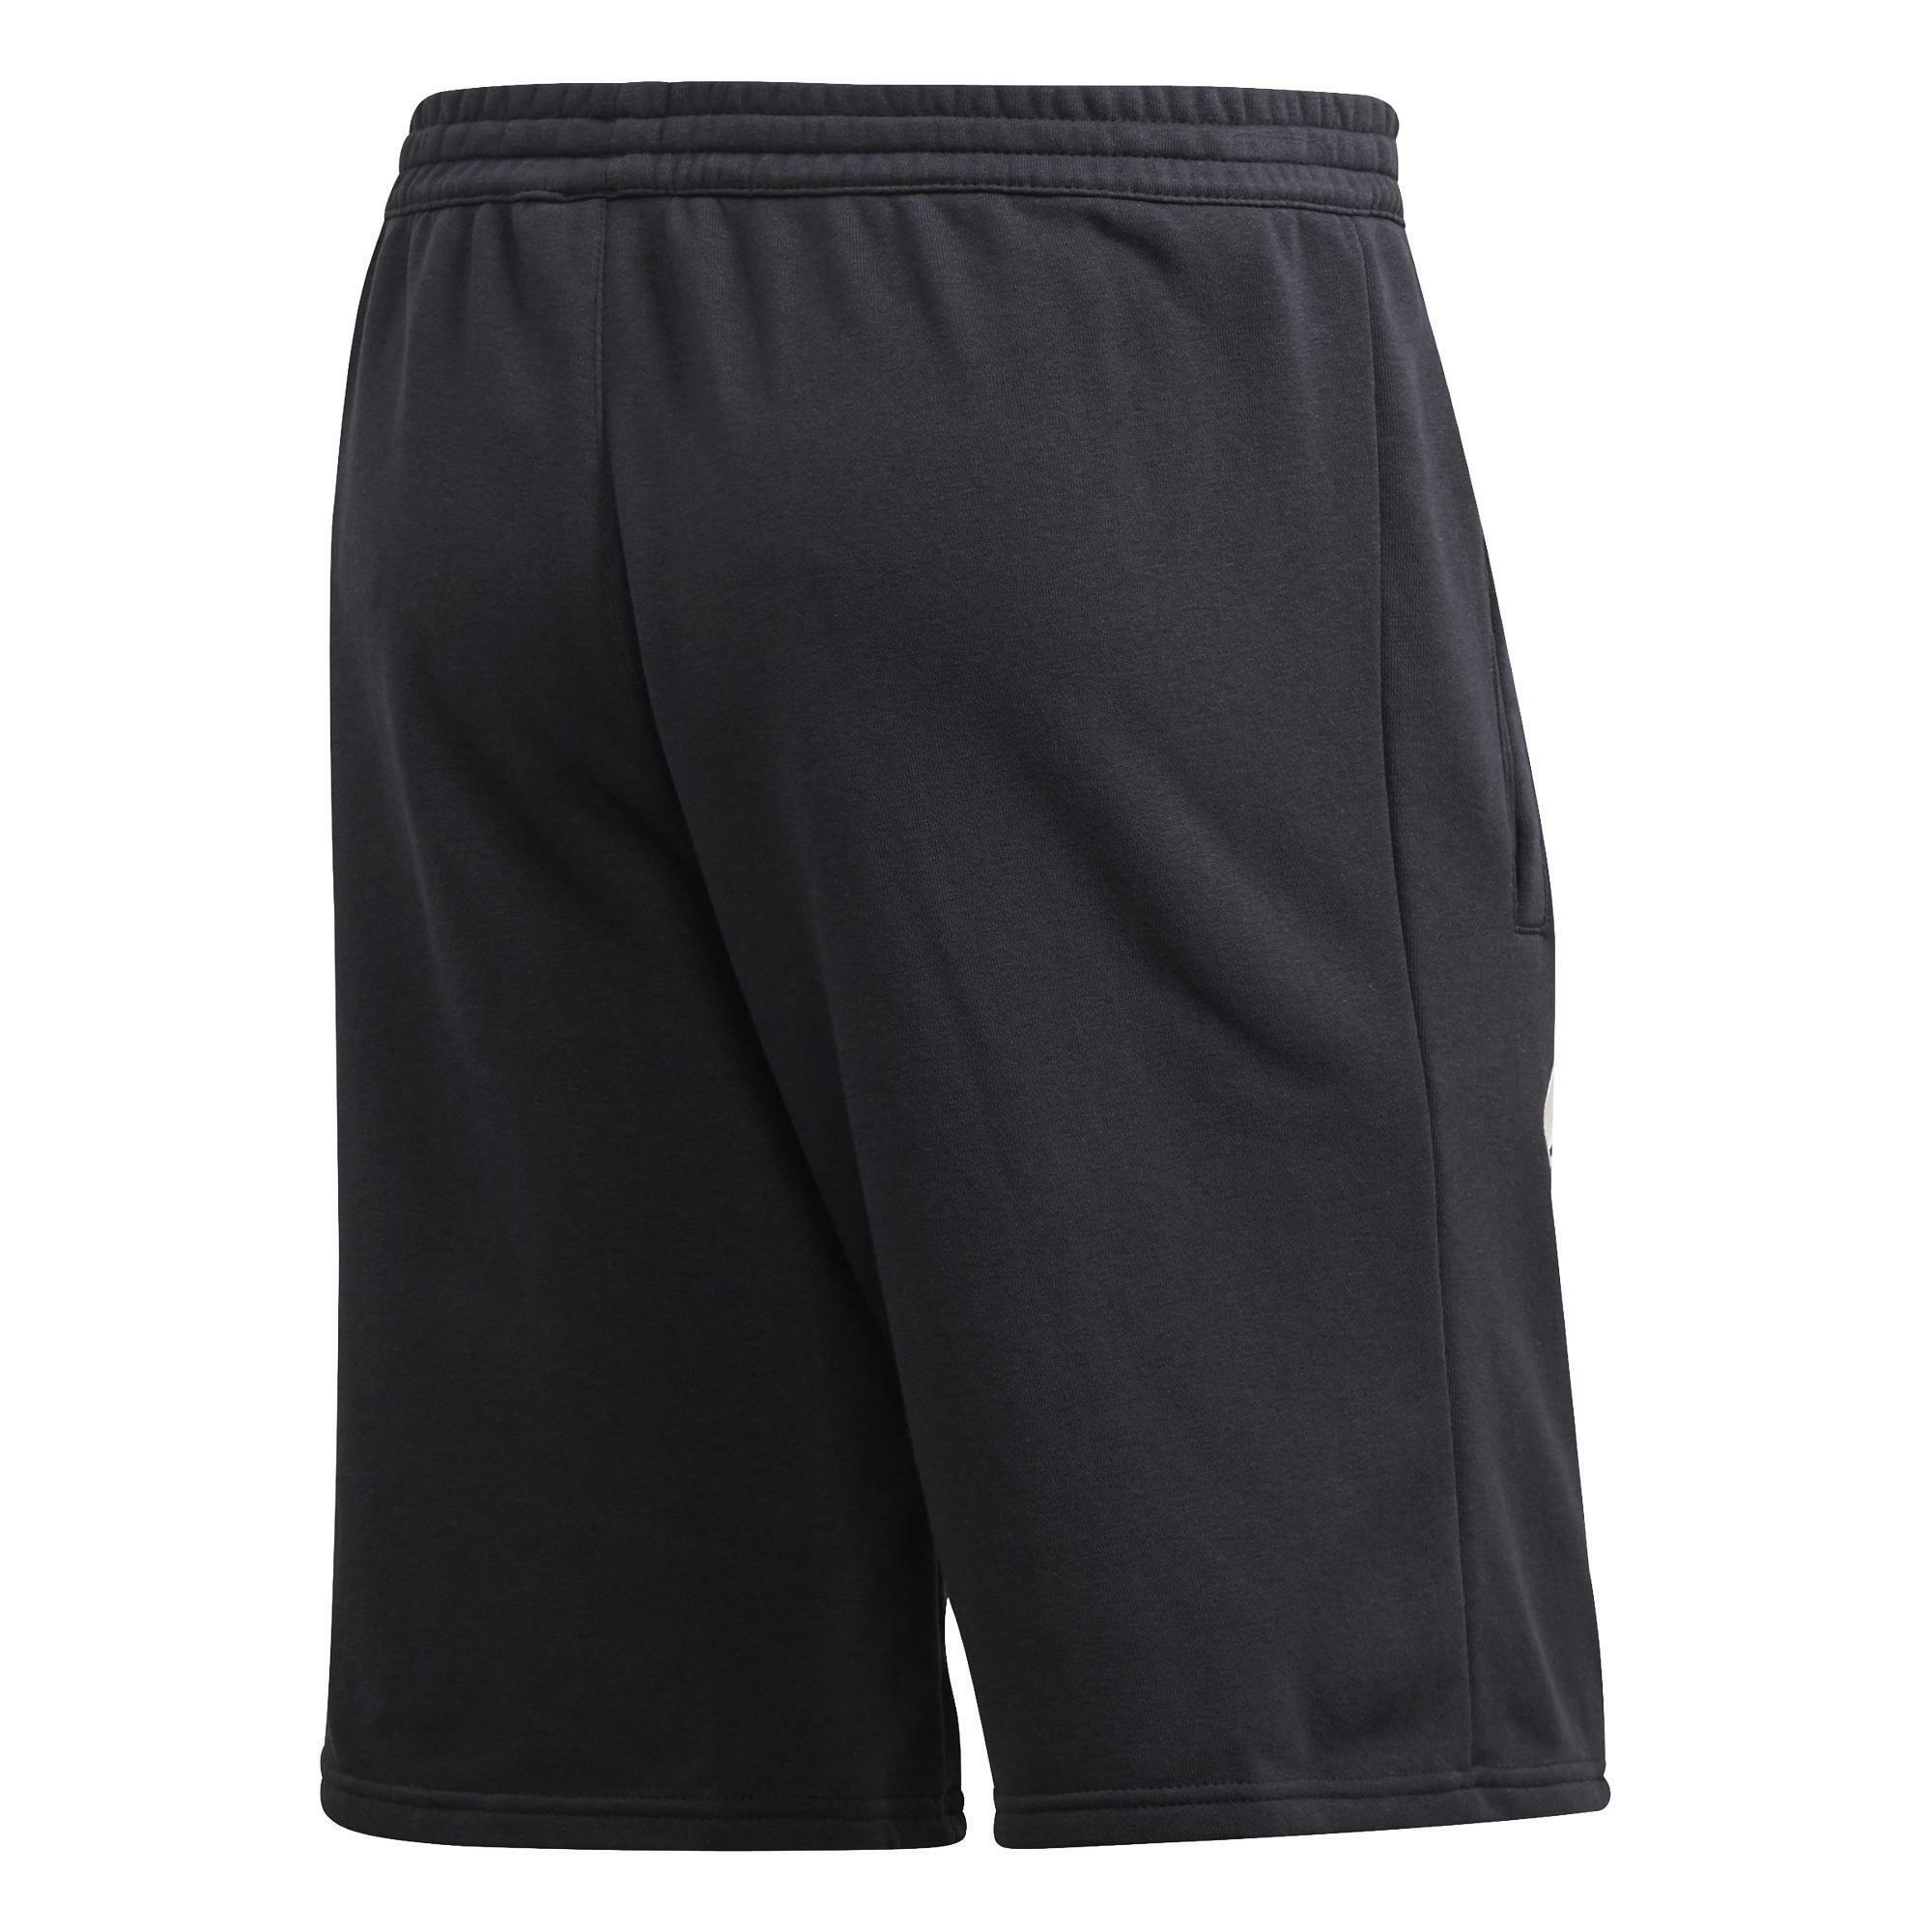 adidas adidas pantaloncino calcio tan sweat logo